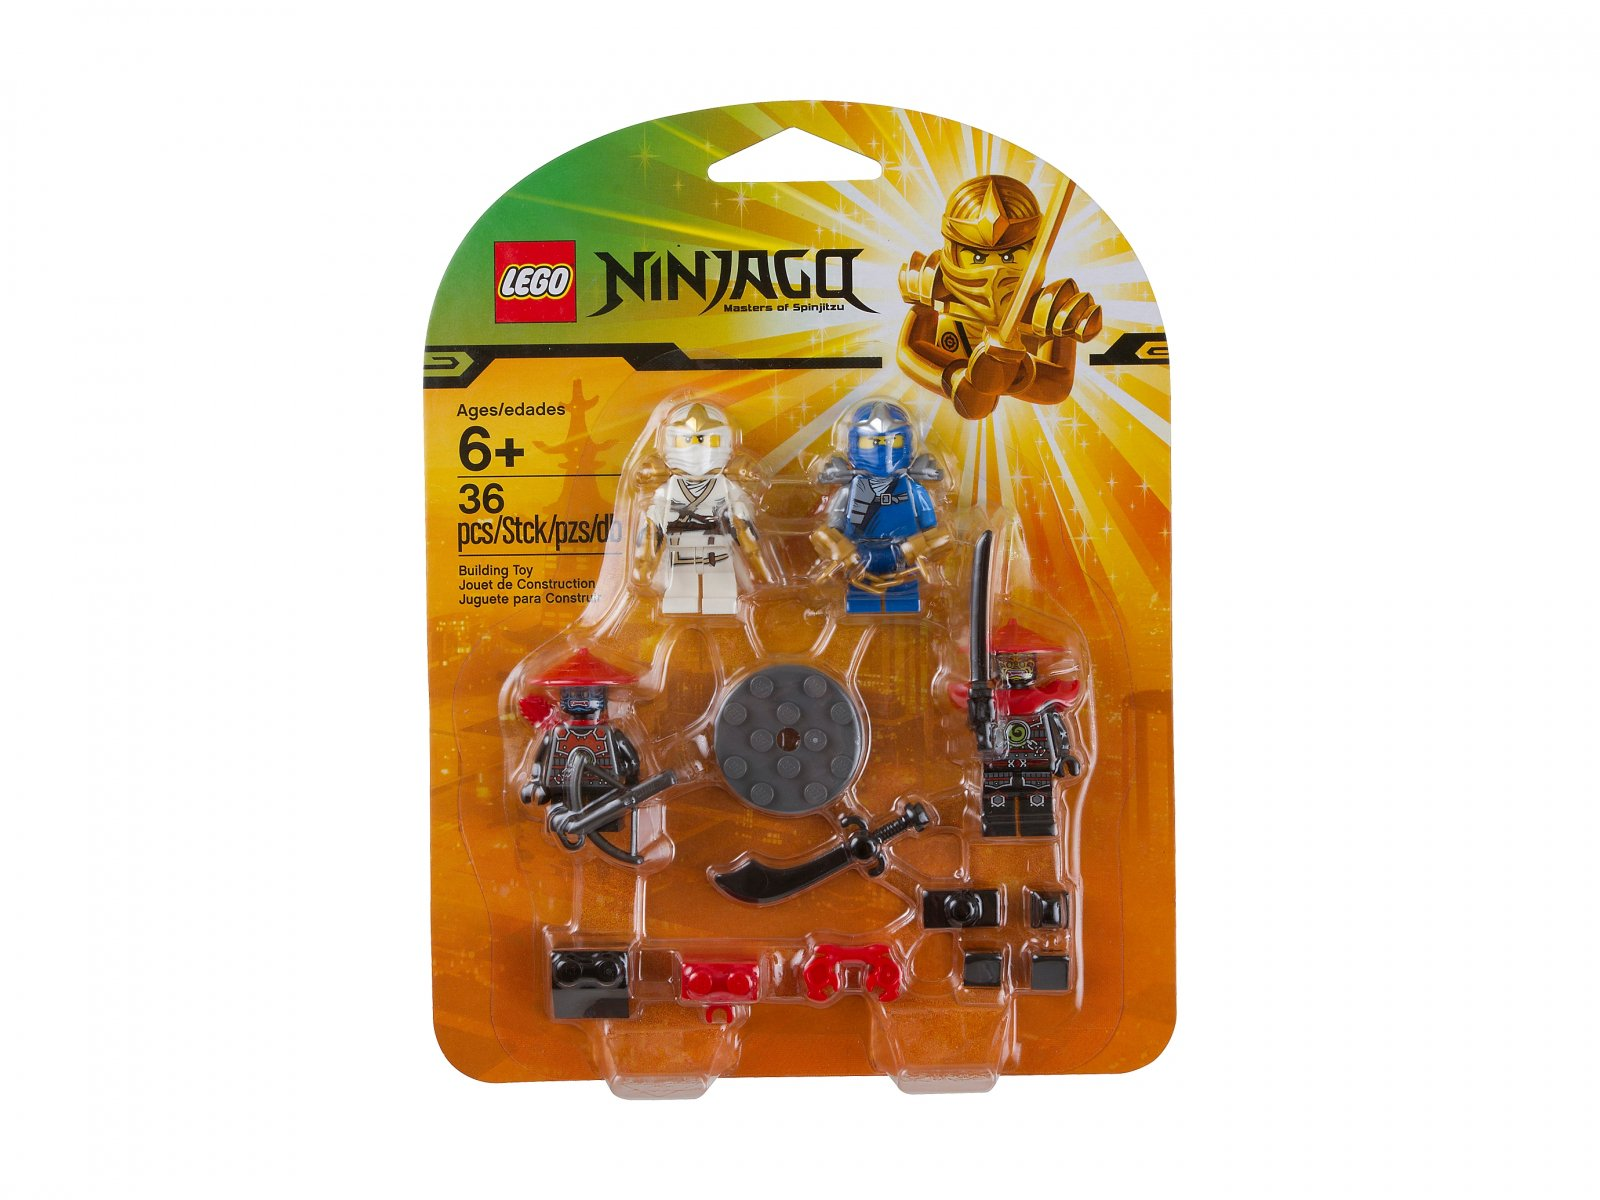 LEGO Ninjago® Samurai Accessory Set 850632